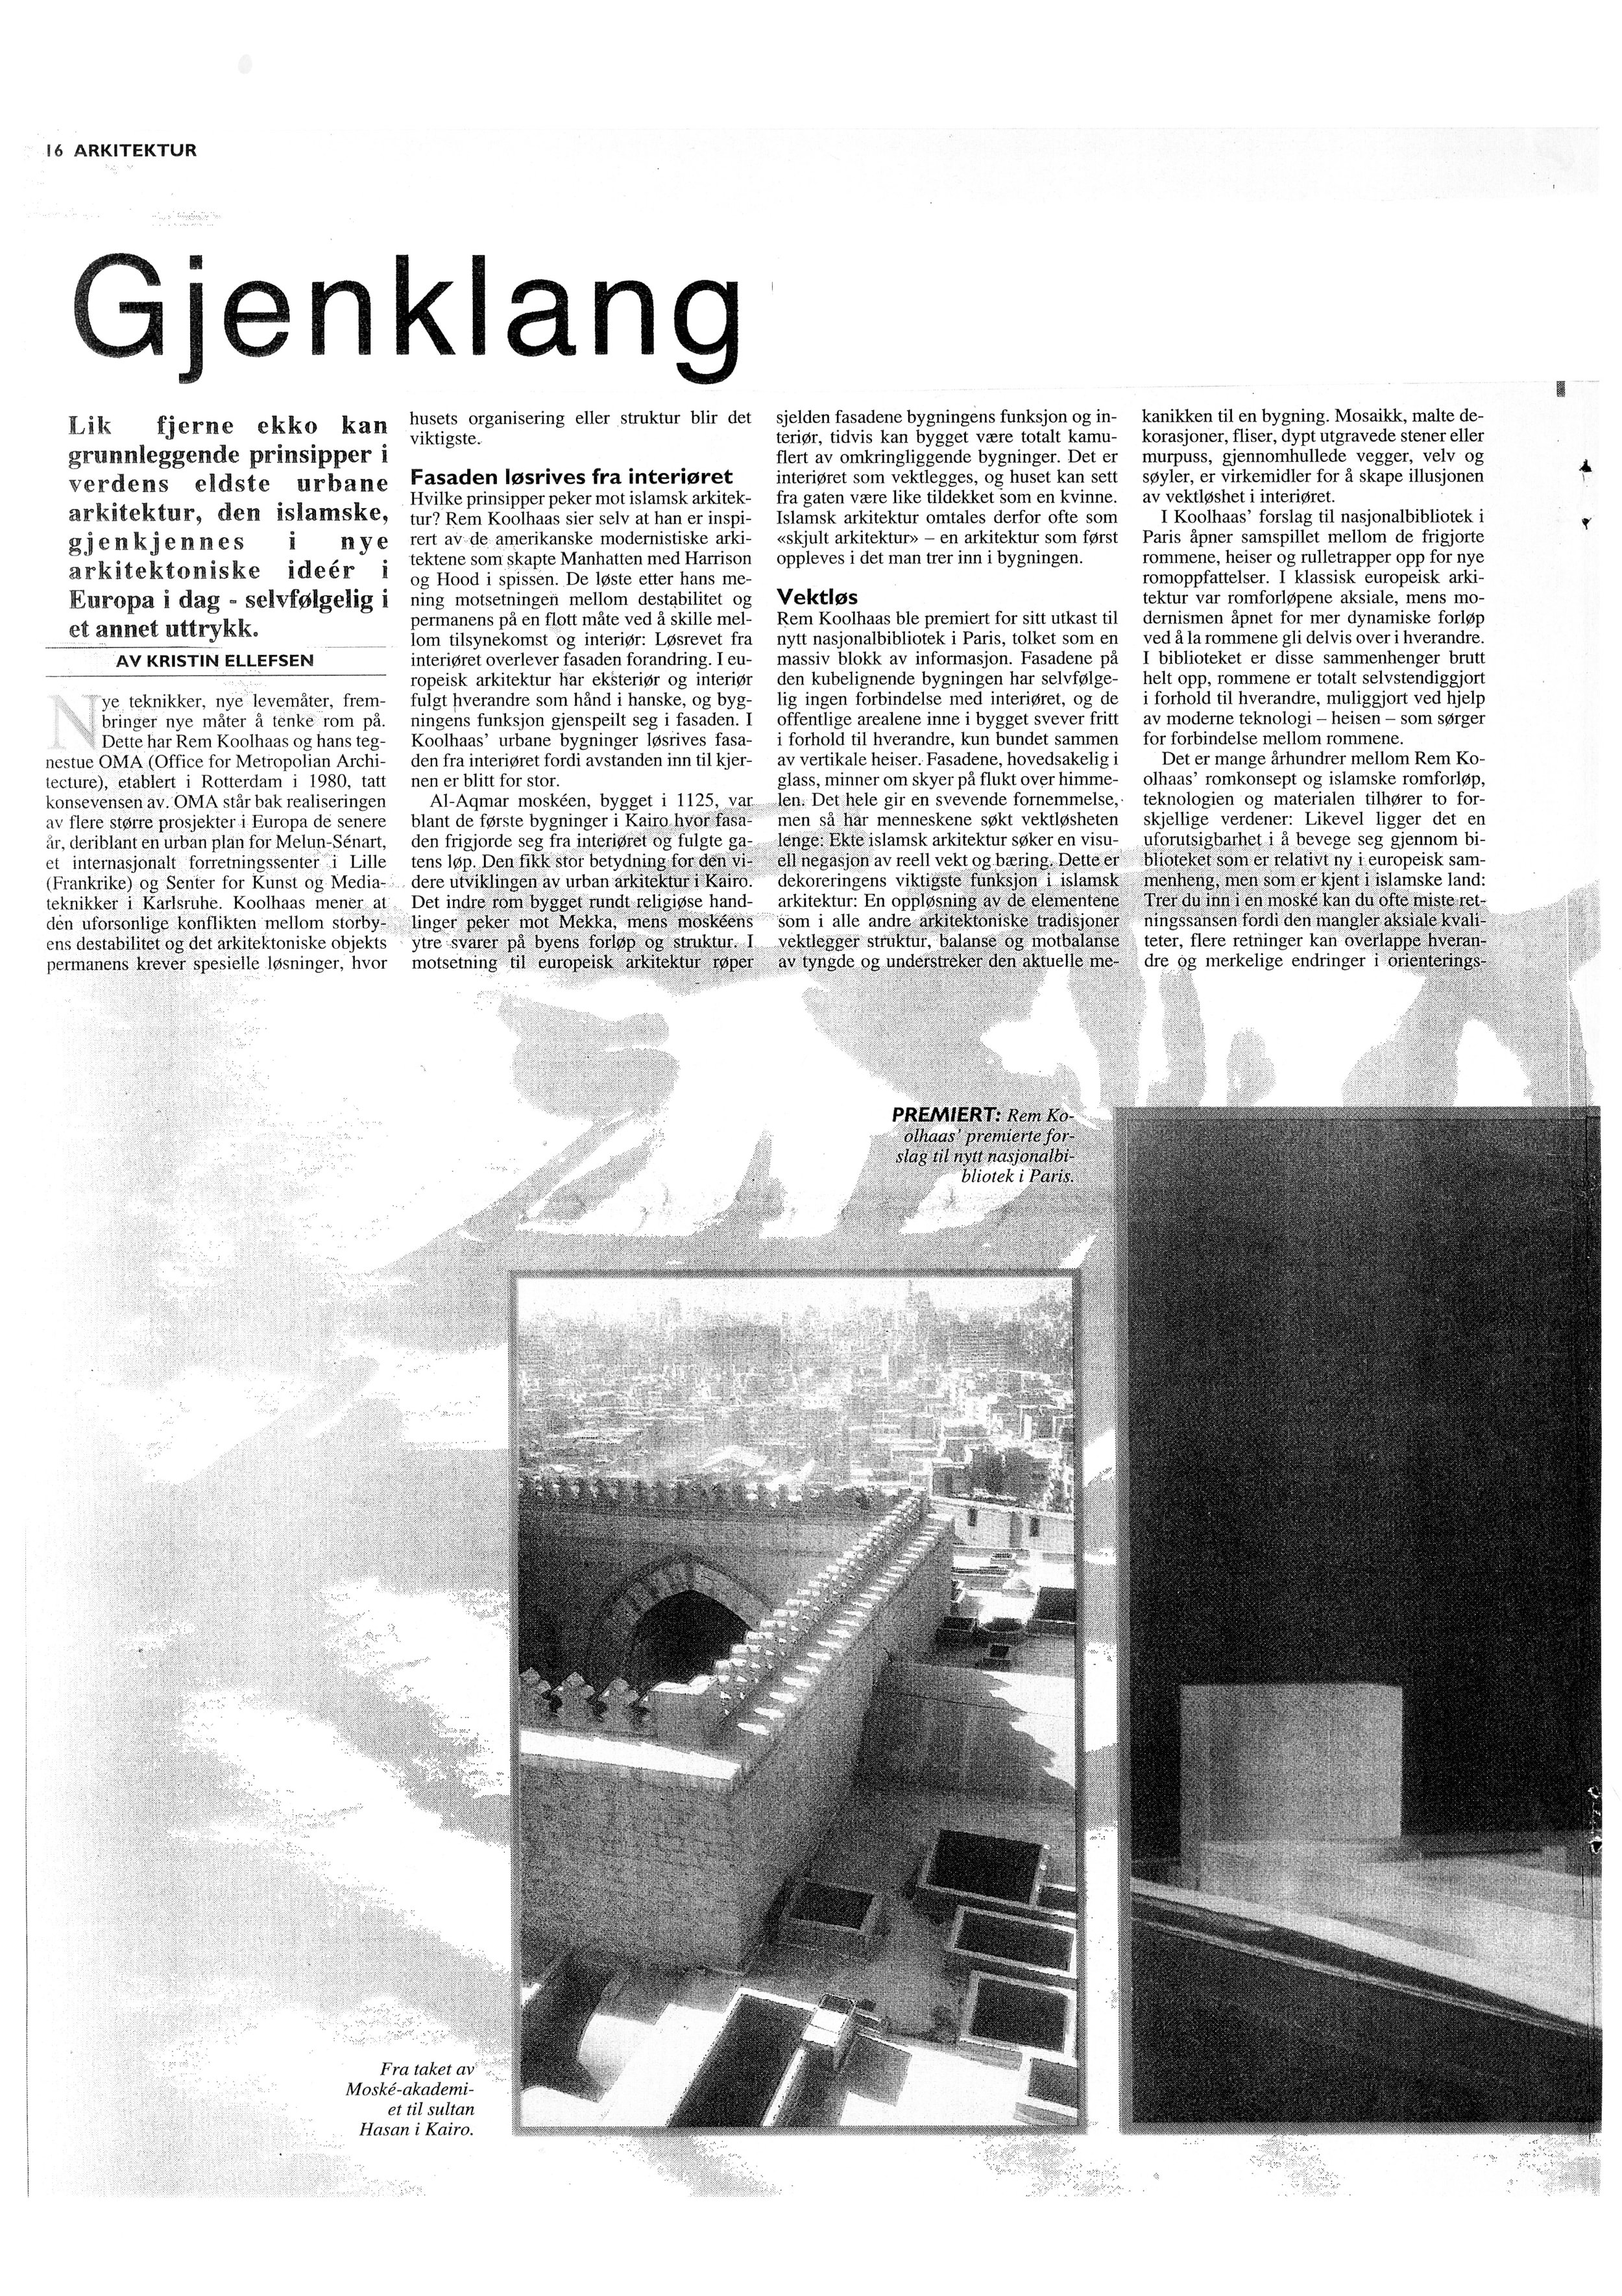 Frilansjournalist, arkitektur og teknologi, MORGENBLADET, 1994-96. -